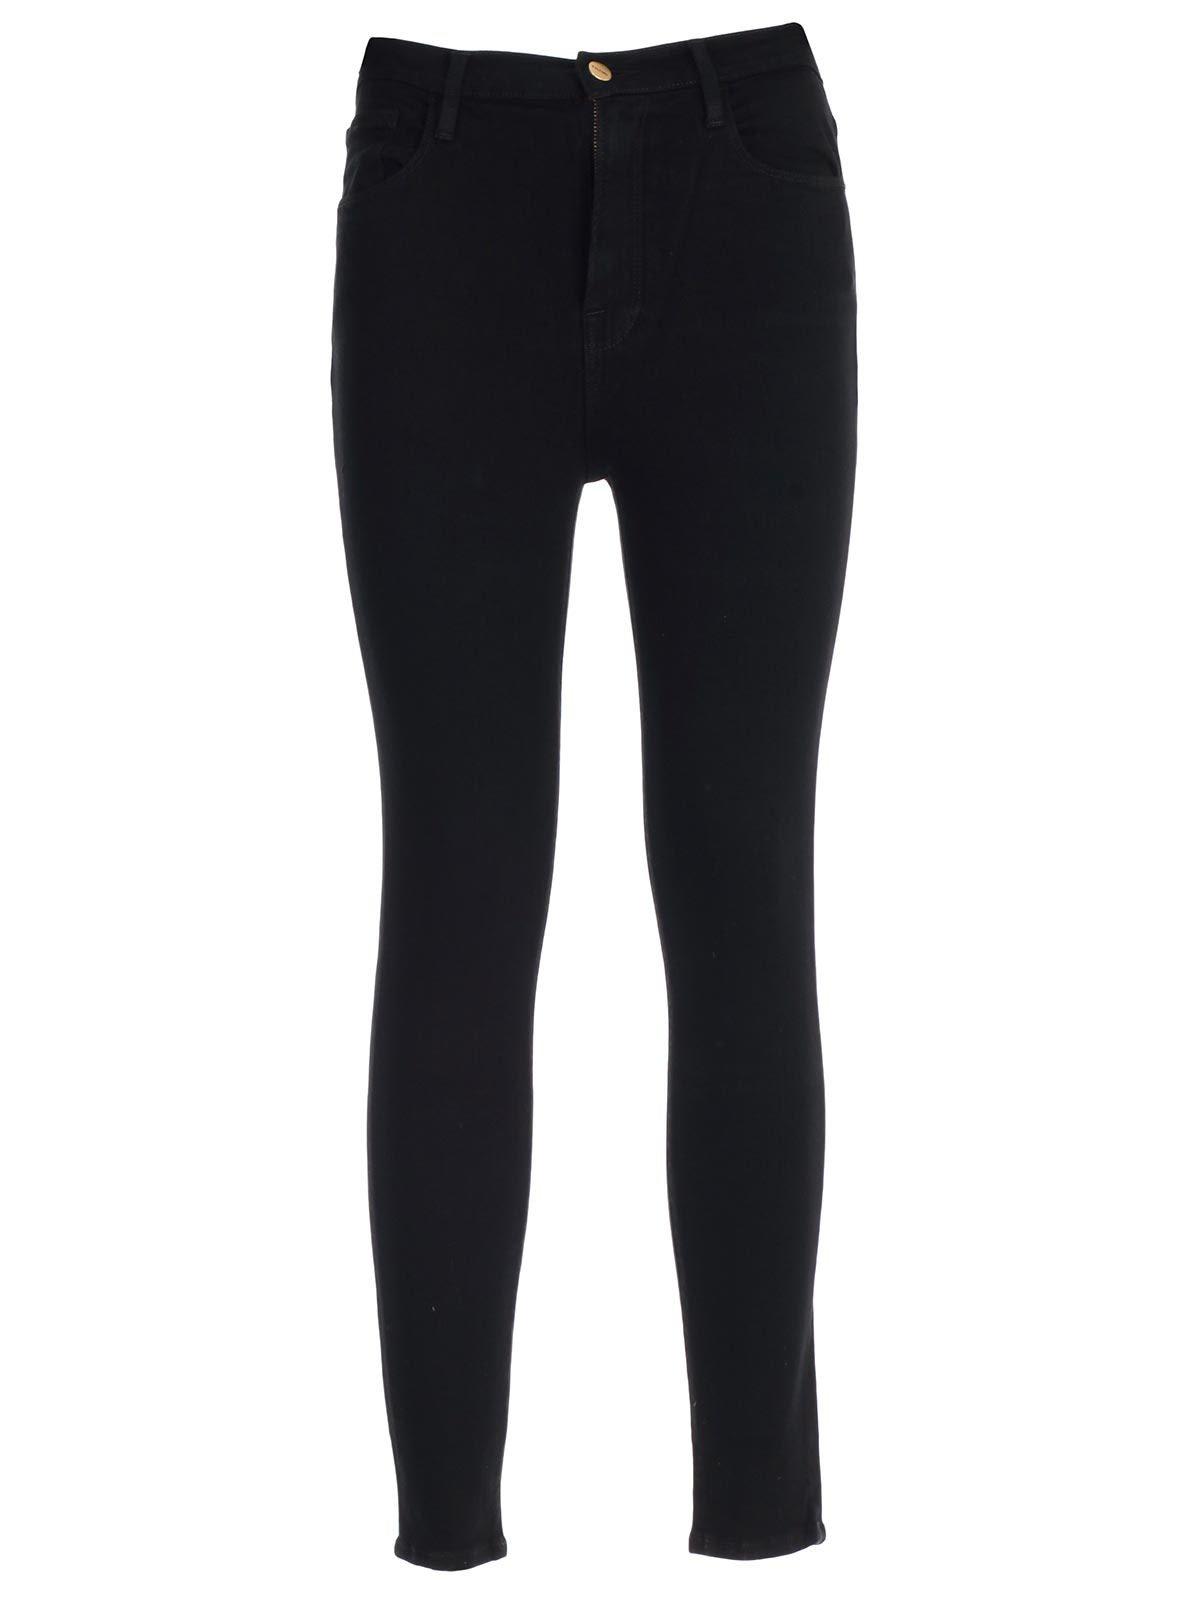 Jeans Skinny Elastic High Waist